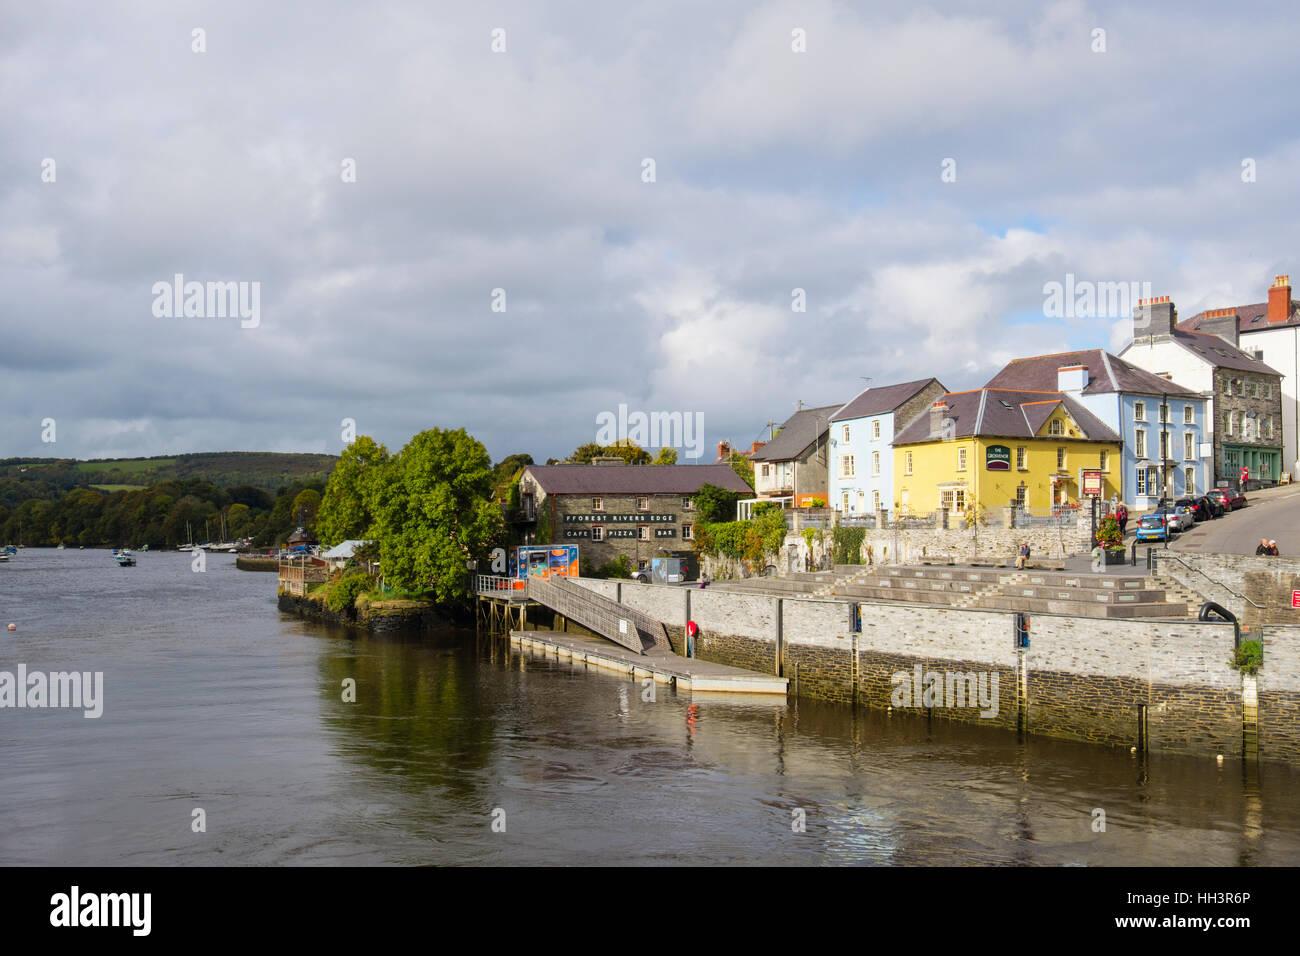 The old port quay on Afon Teifi River. Cardigan (Aberteifi), Ceredigion, Wales, UK, Britain Stock Photo